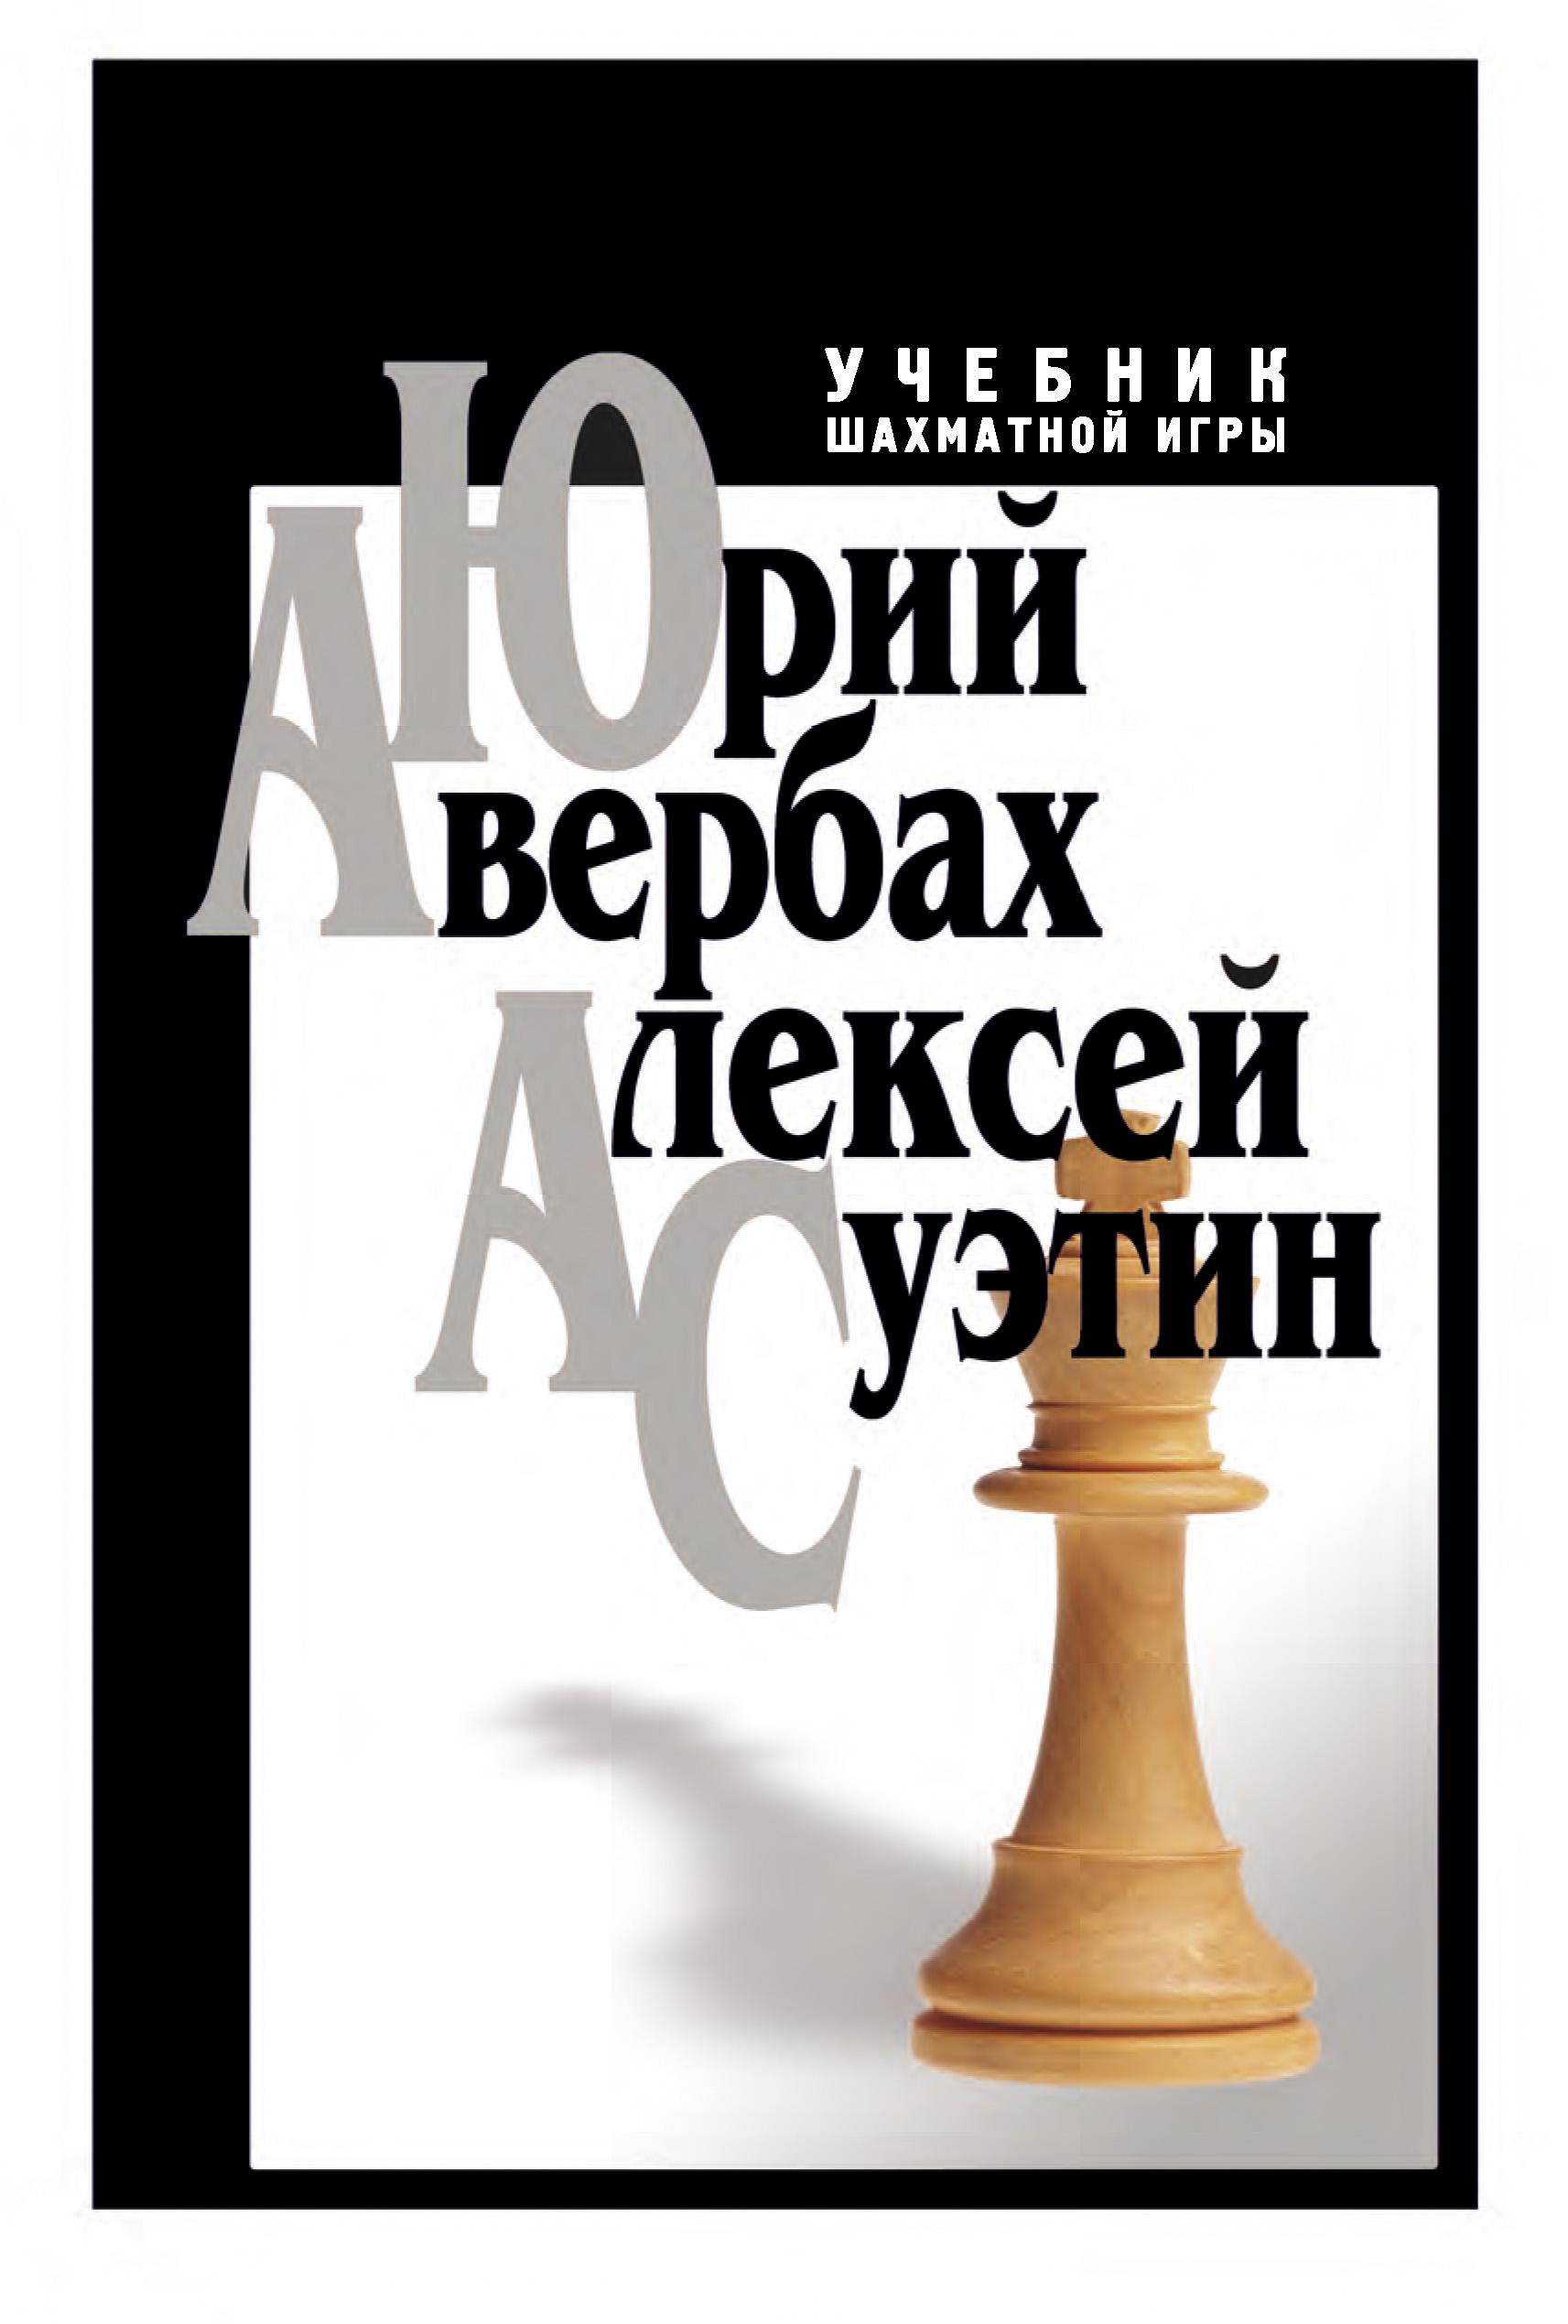 Алексей Суэтин Учебник шахматной игры авербах ю суэтин а учебник шахматной игры